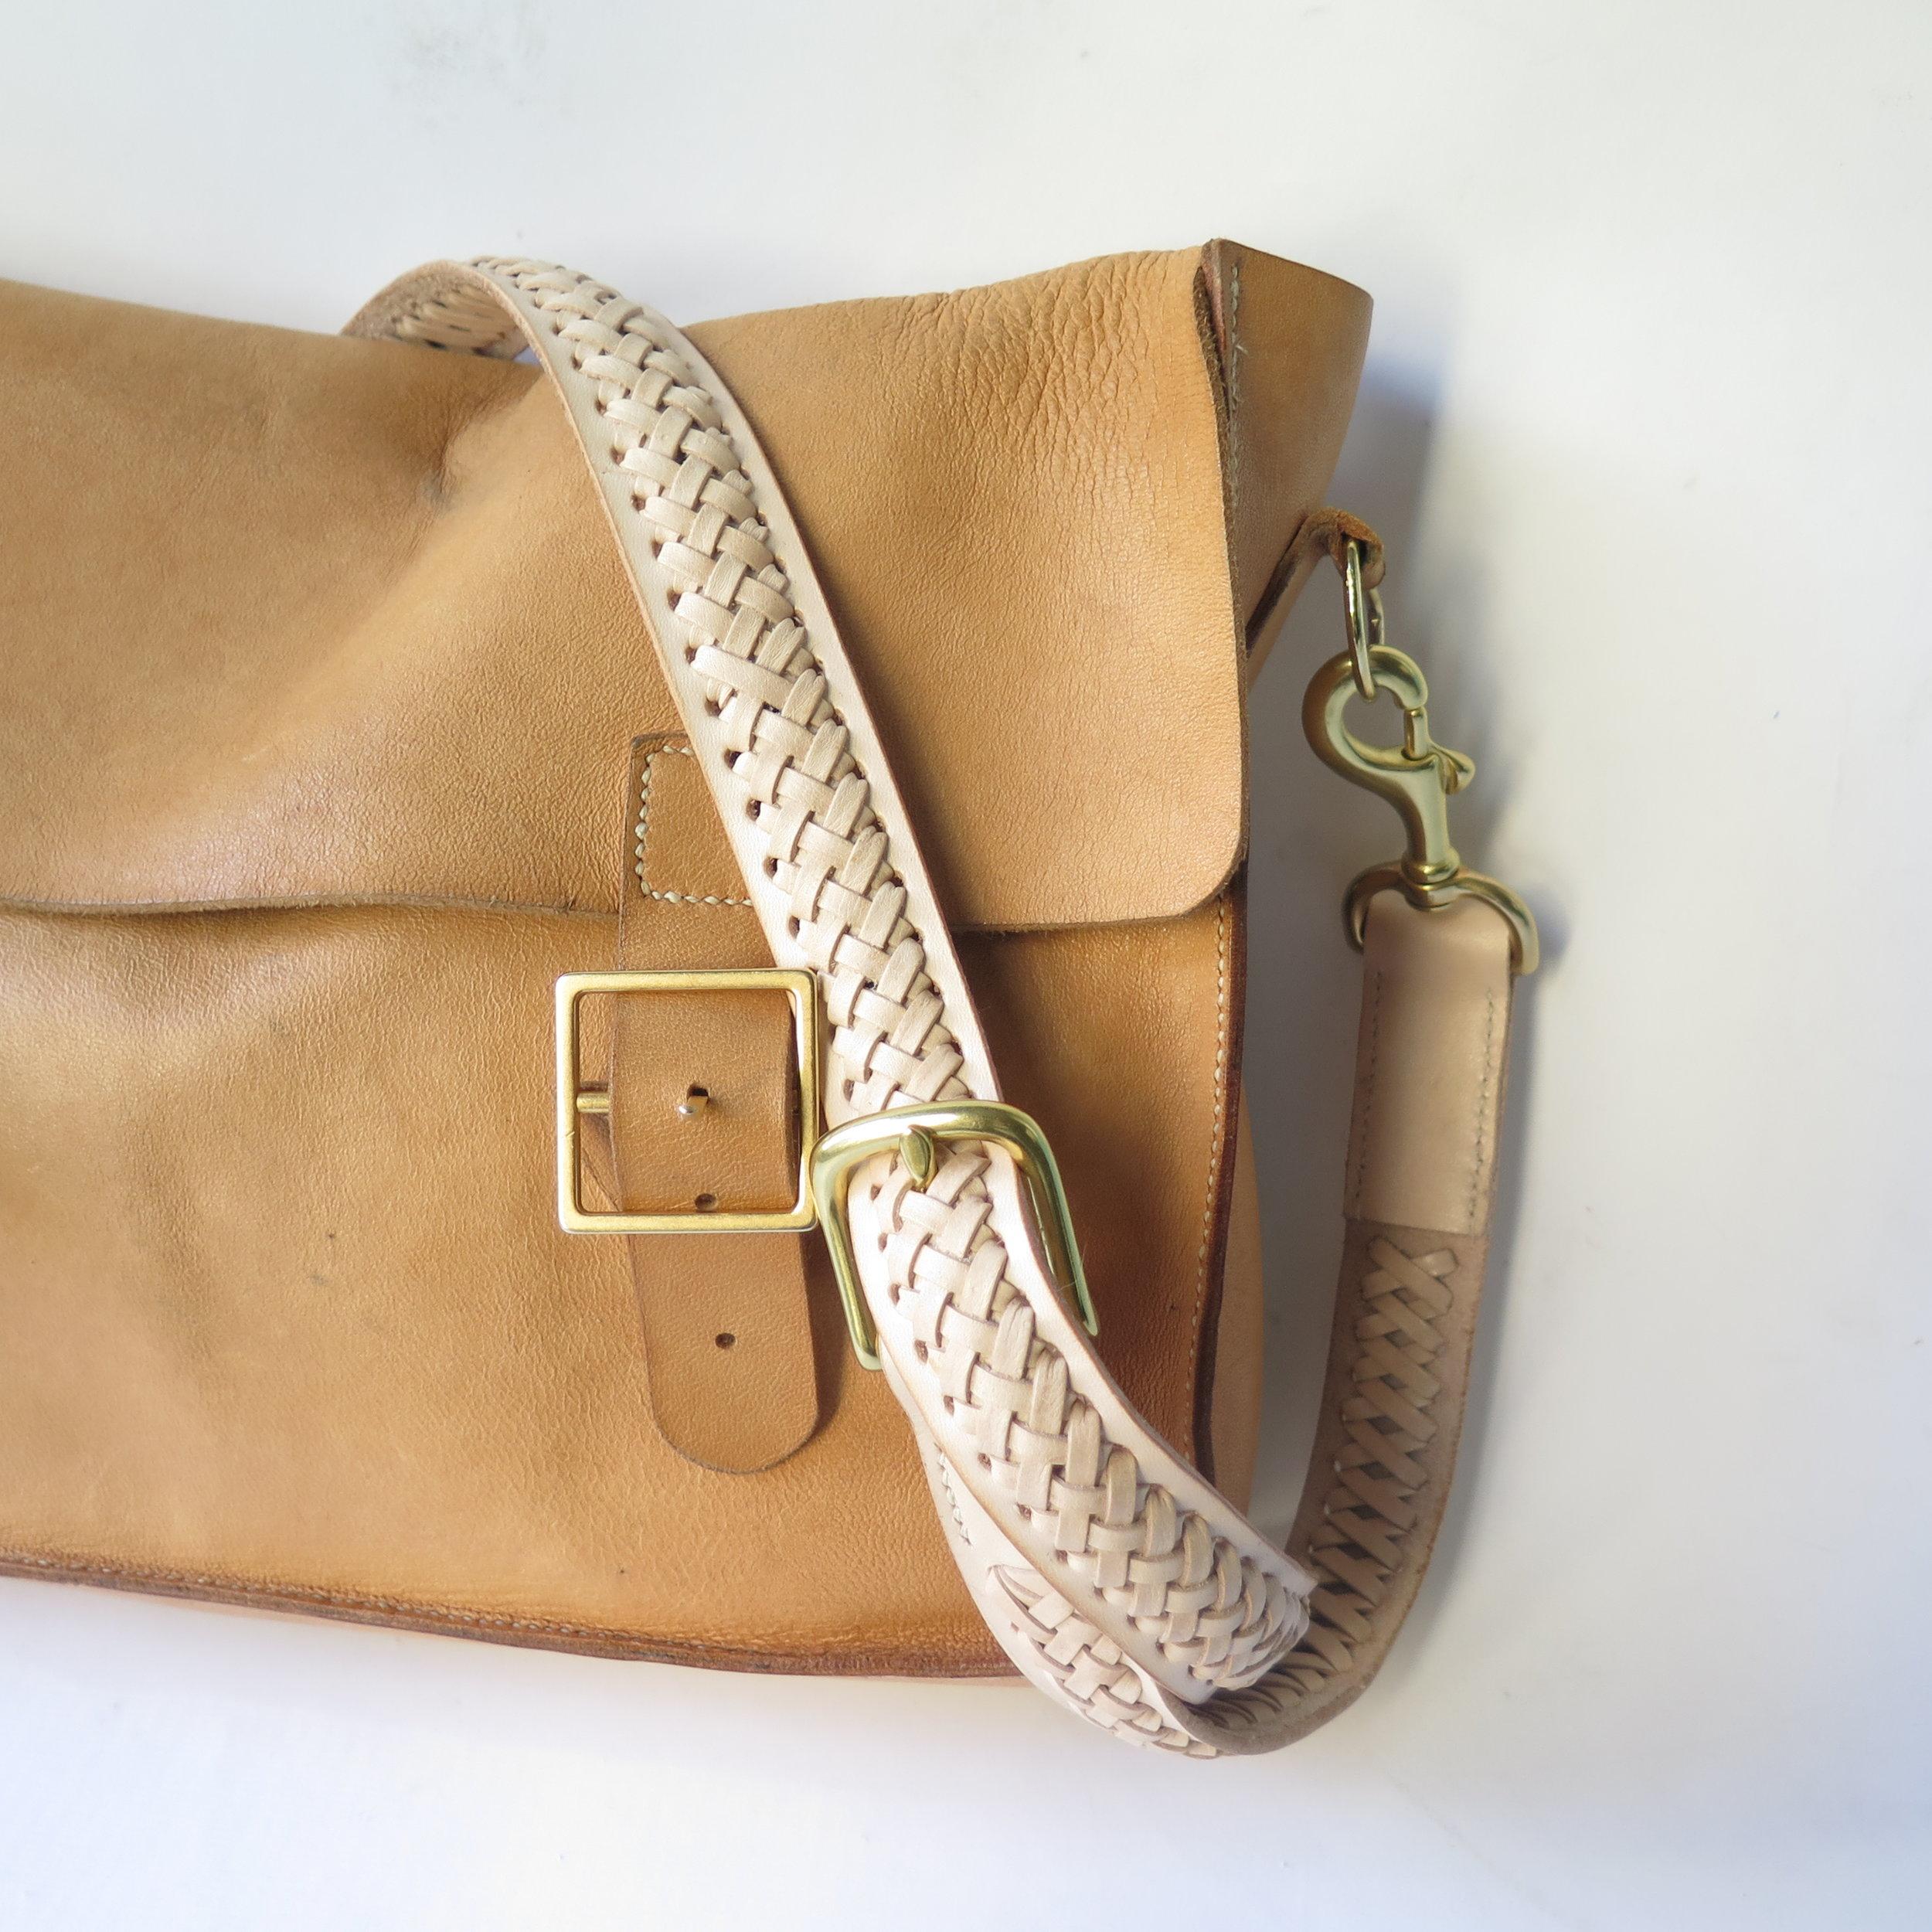 Mary-Savel-Bucky-Bag-Leather-handbag-saddle-stitch.4.JPG